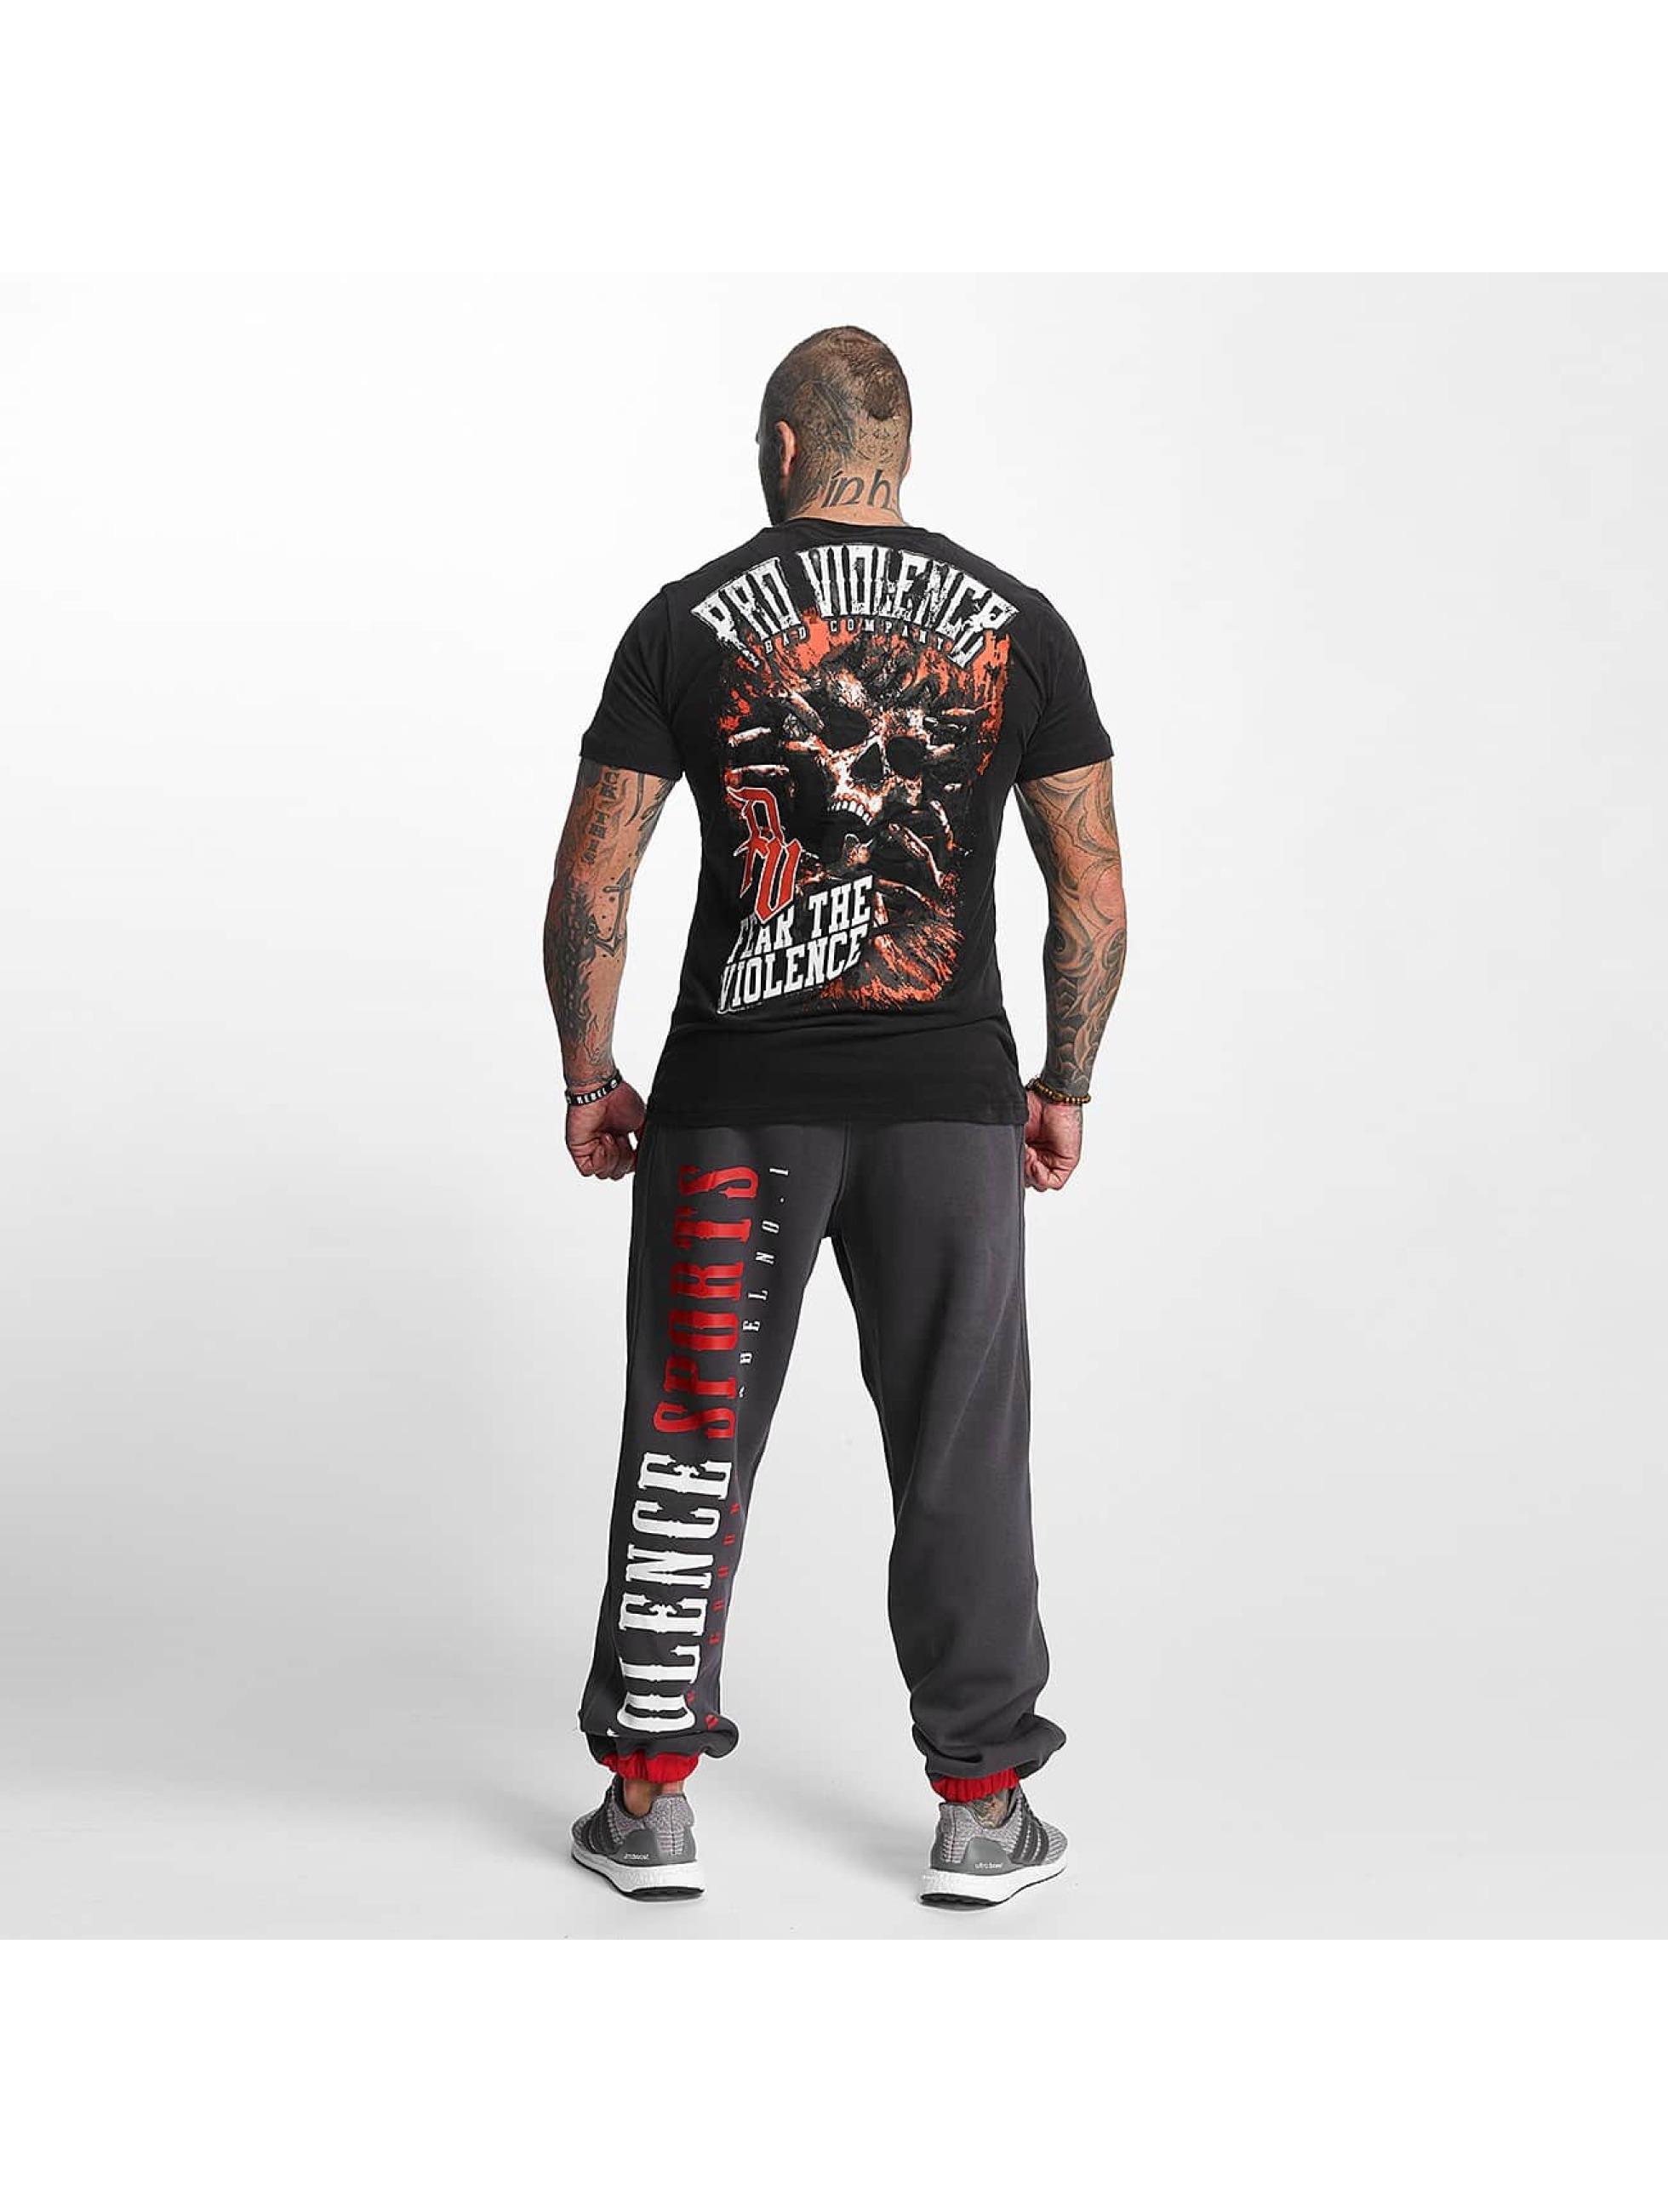 Pro Violence Streetwear T-Shirt The Violence Fear schwarz